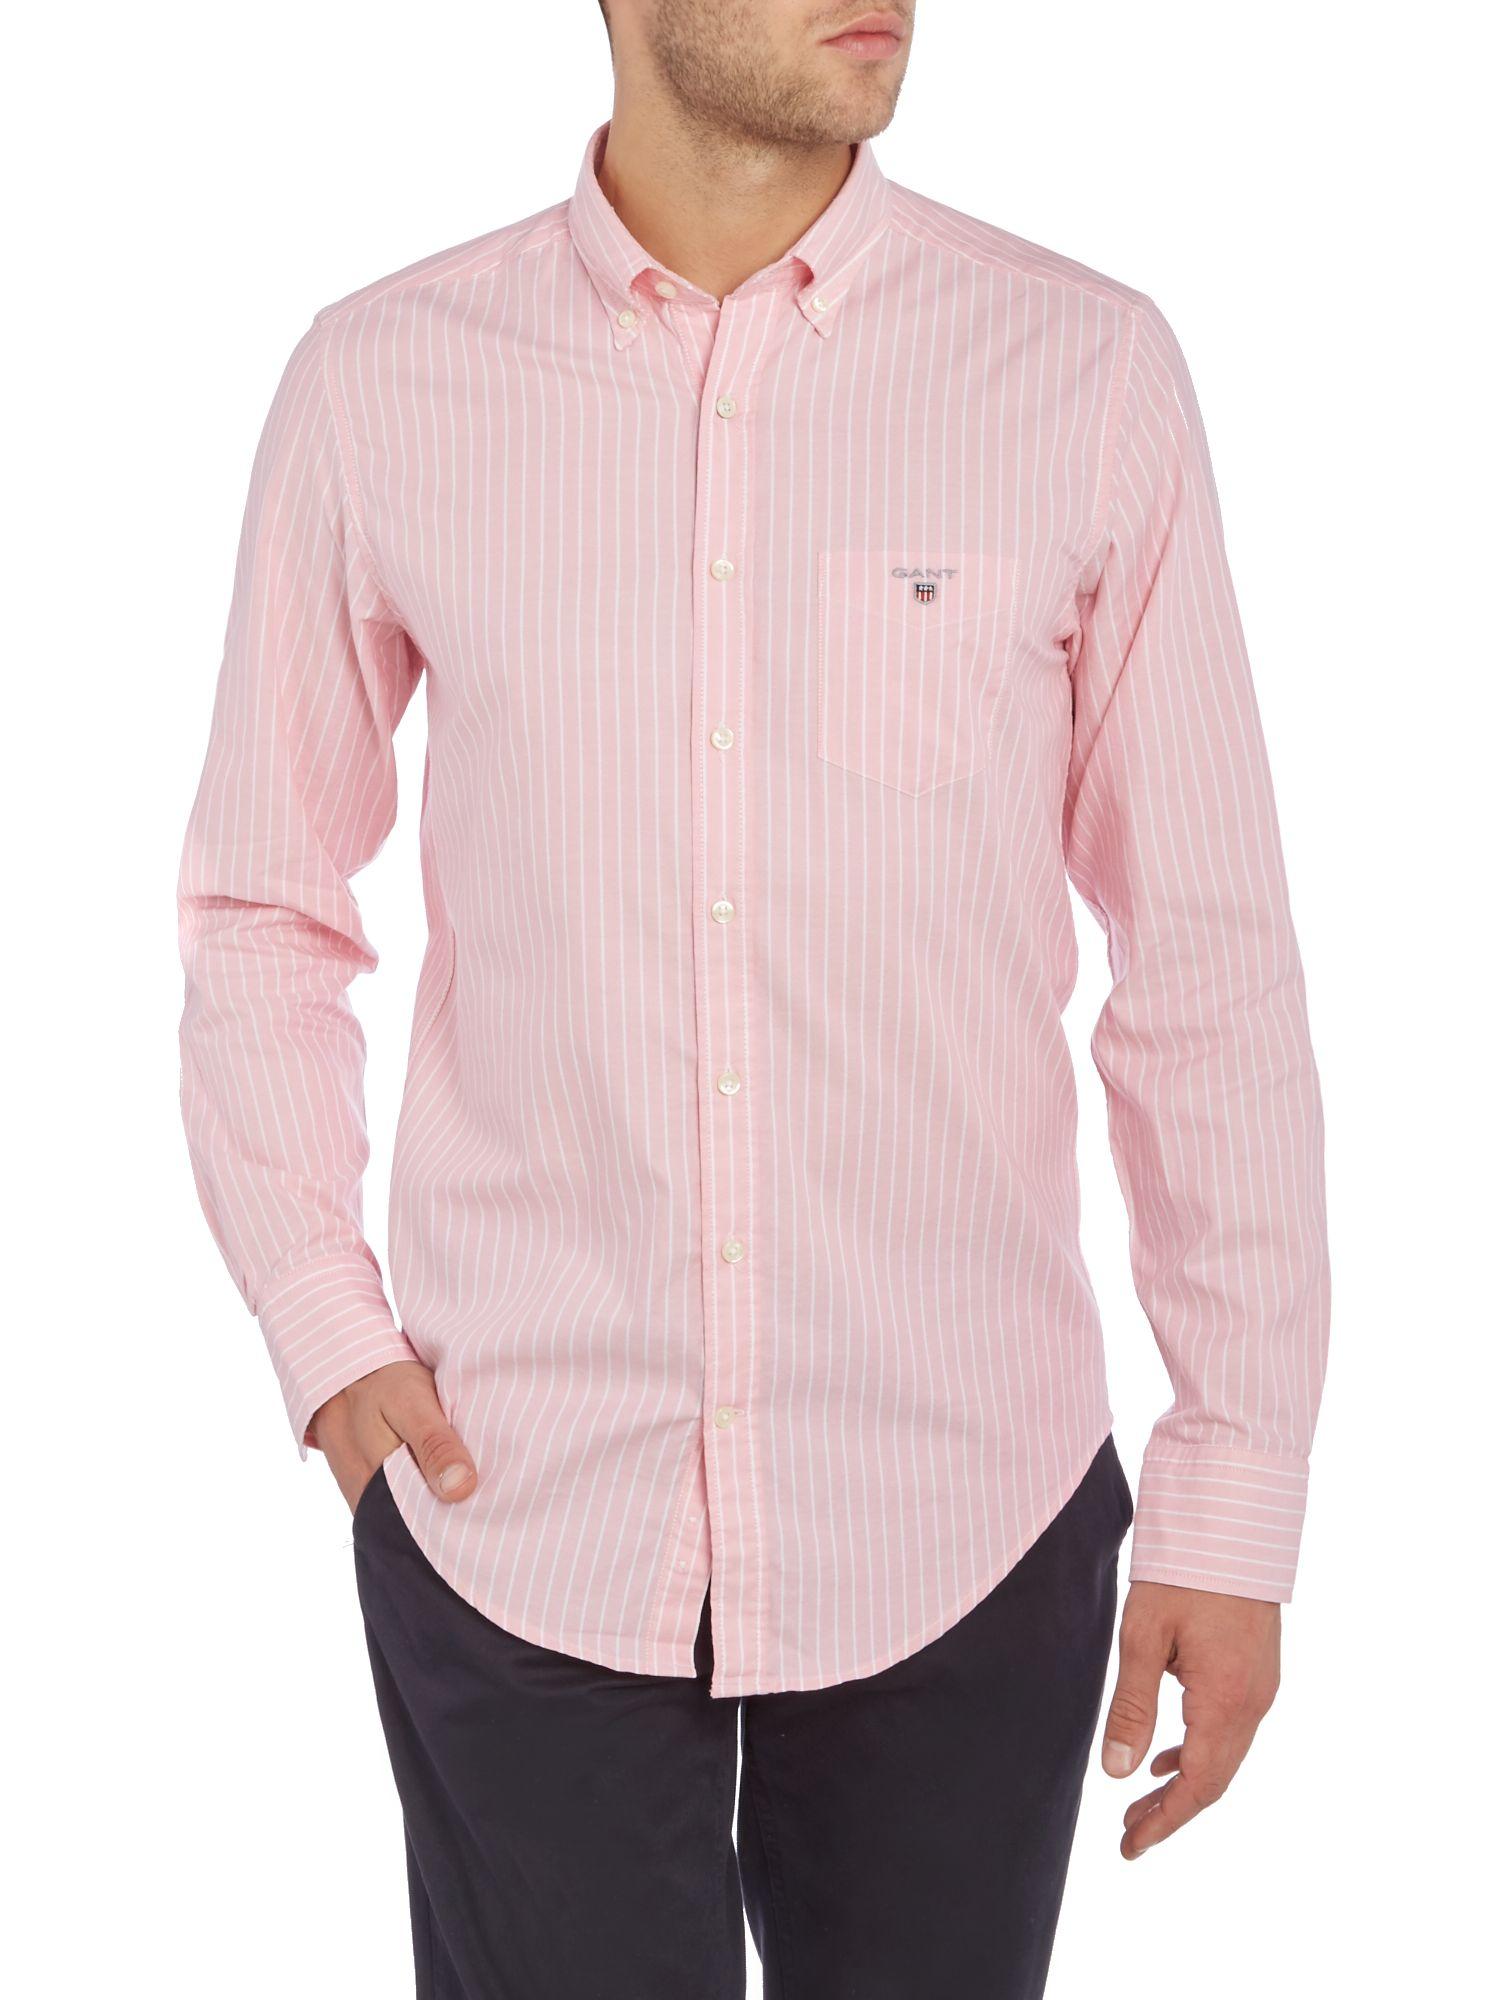 GANT Cotton Breton Stripe Long Sleeve Shirt in Pink for Men